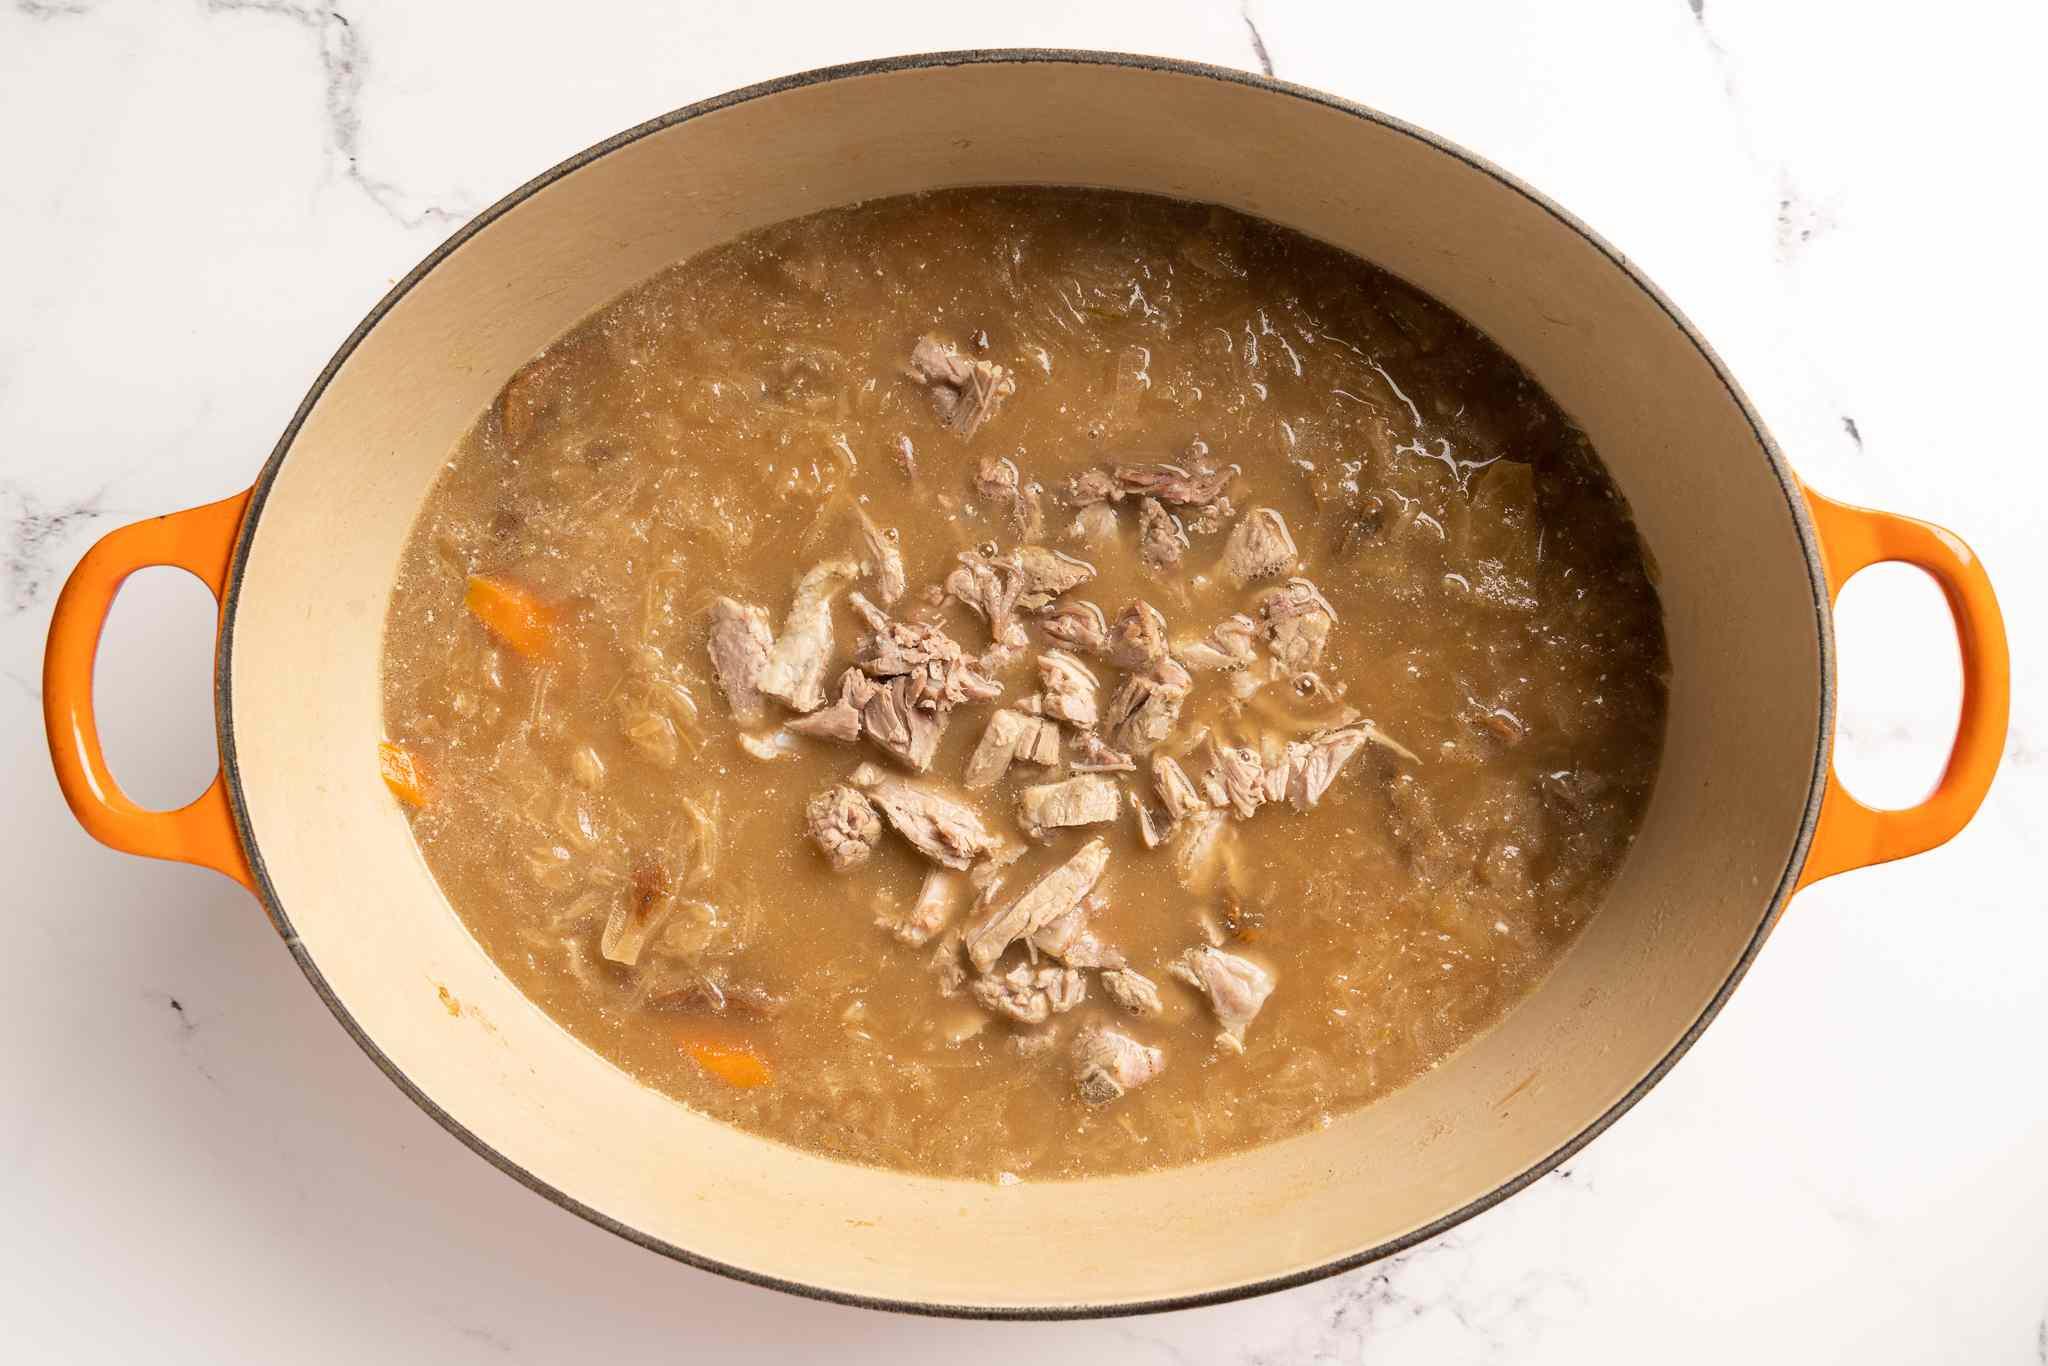 Ukrainian Sauerkraut Soup (Kapusnyak) in a Dutch oven